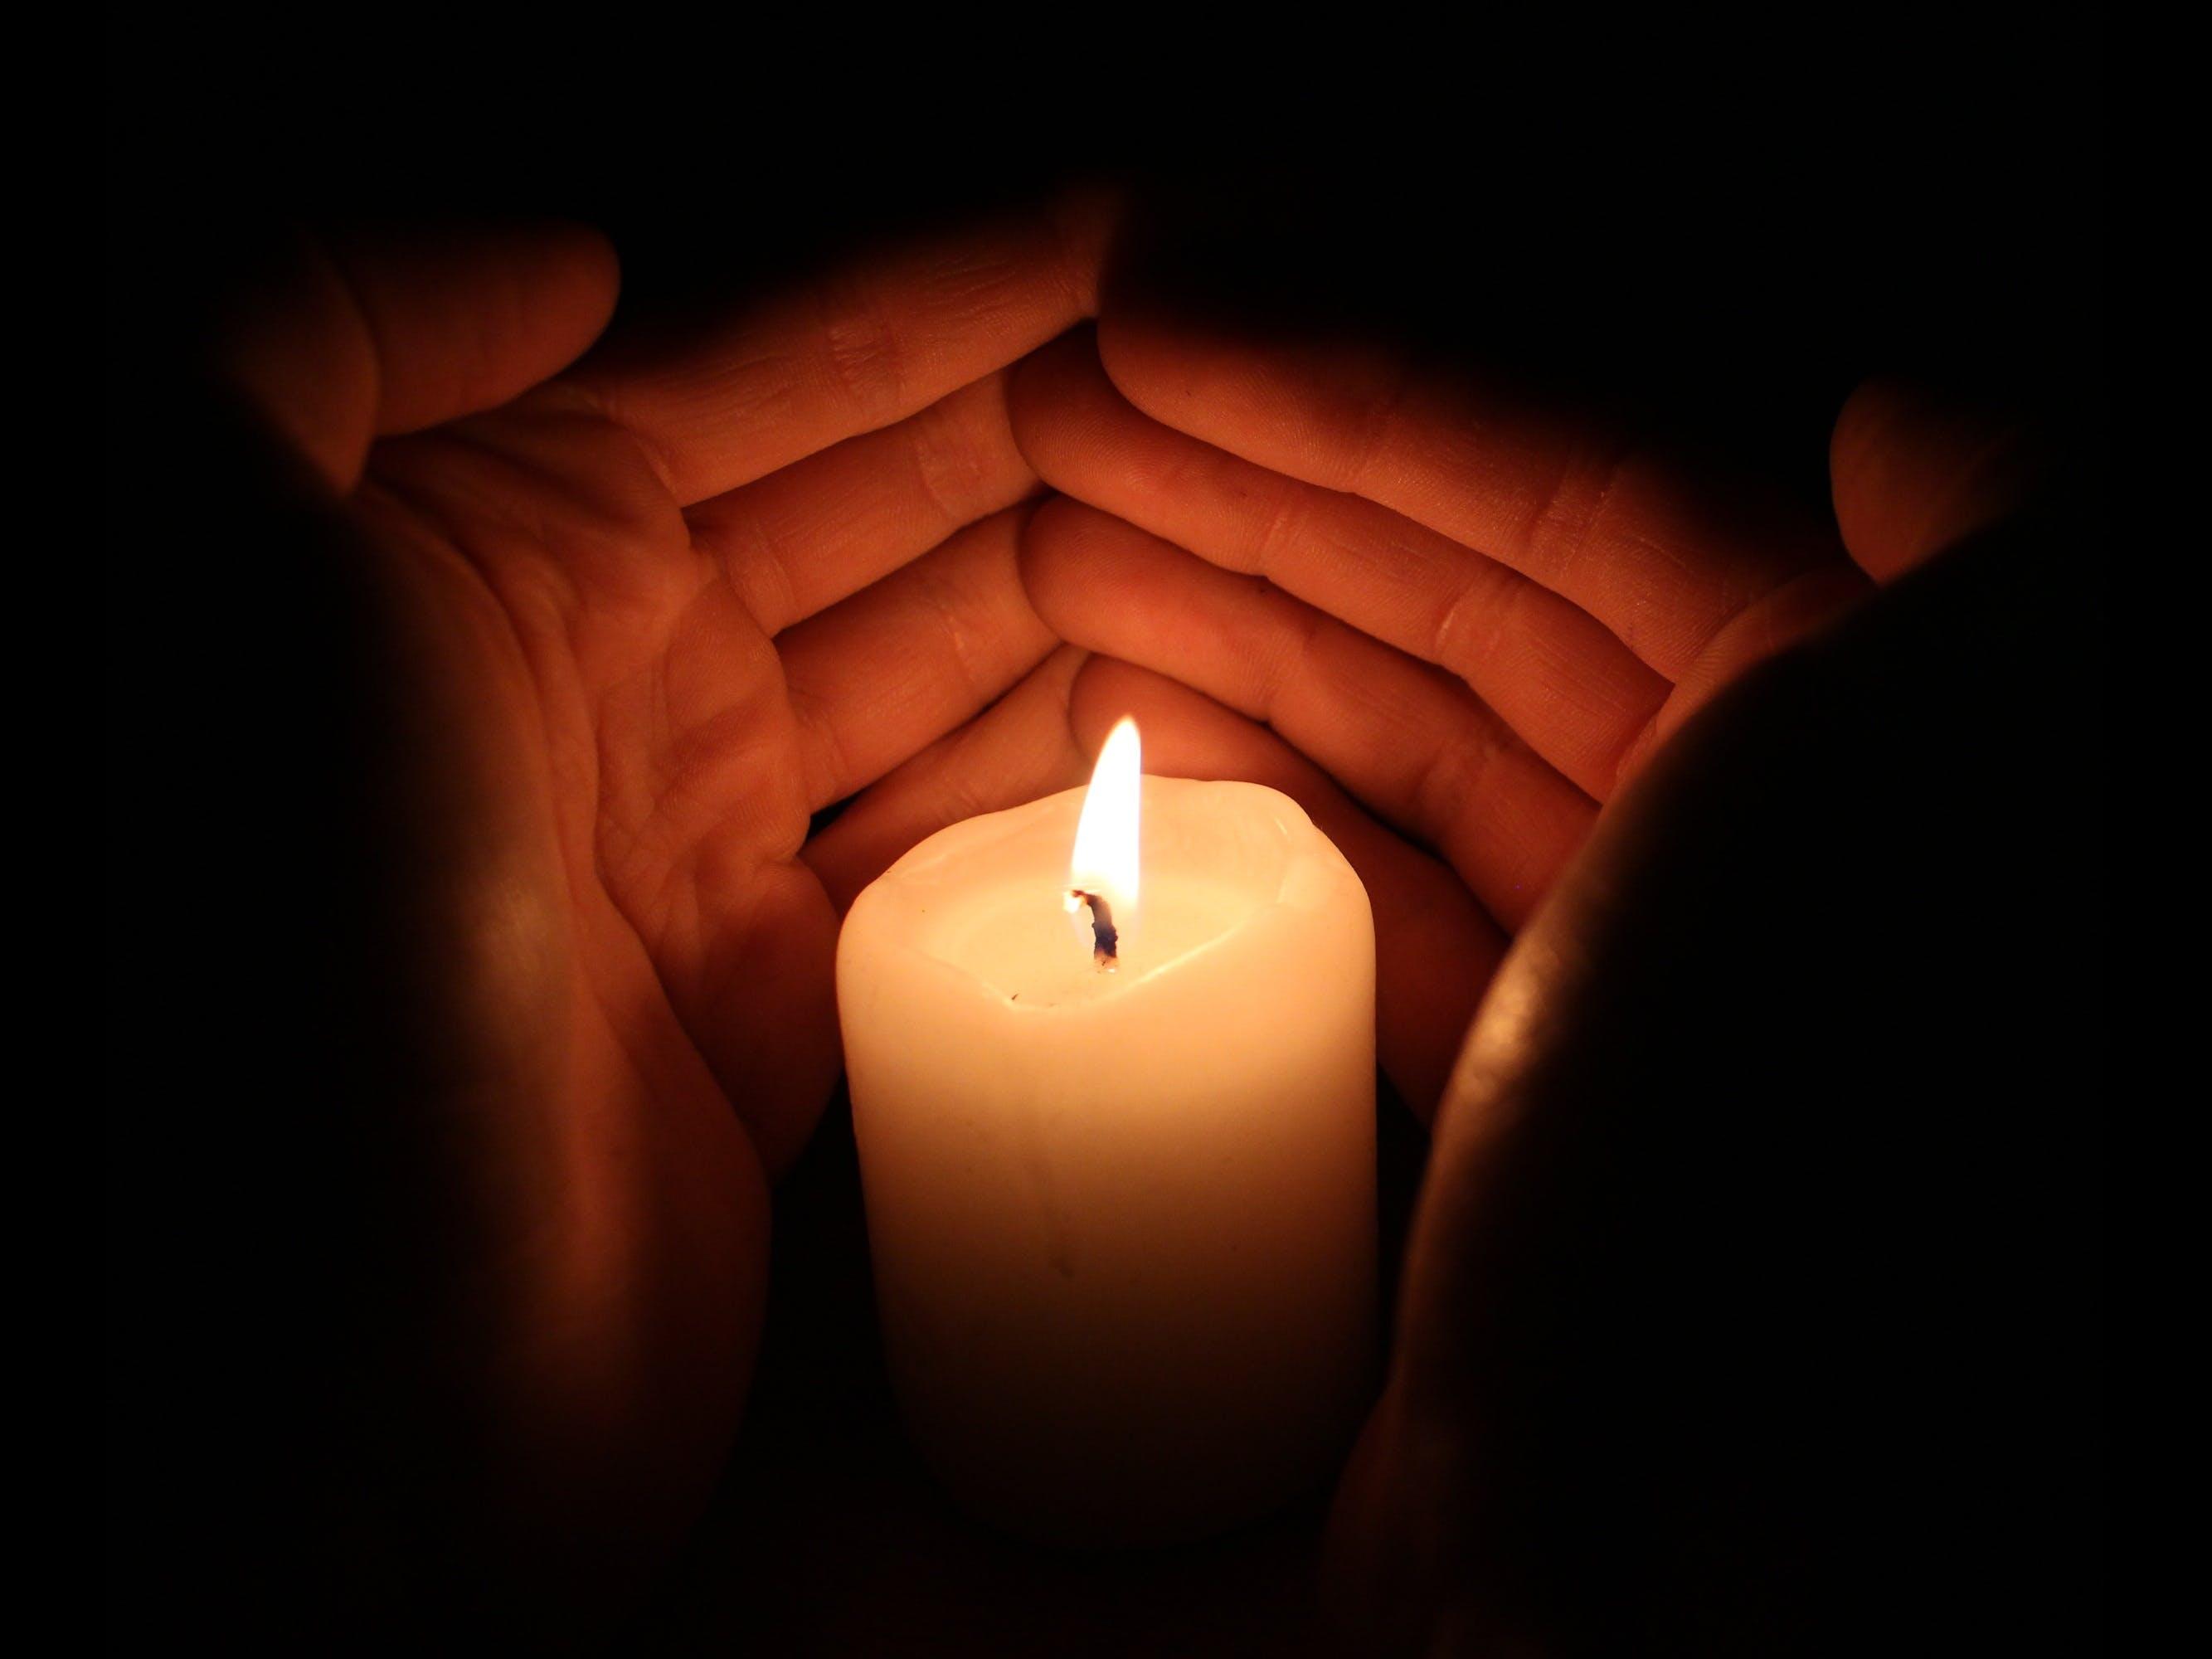 Free stock photo of black, bright, burning, candle